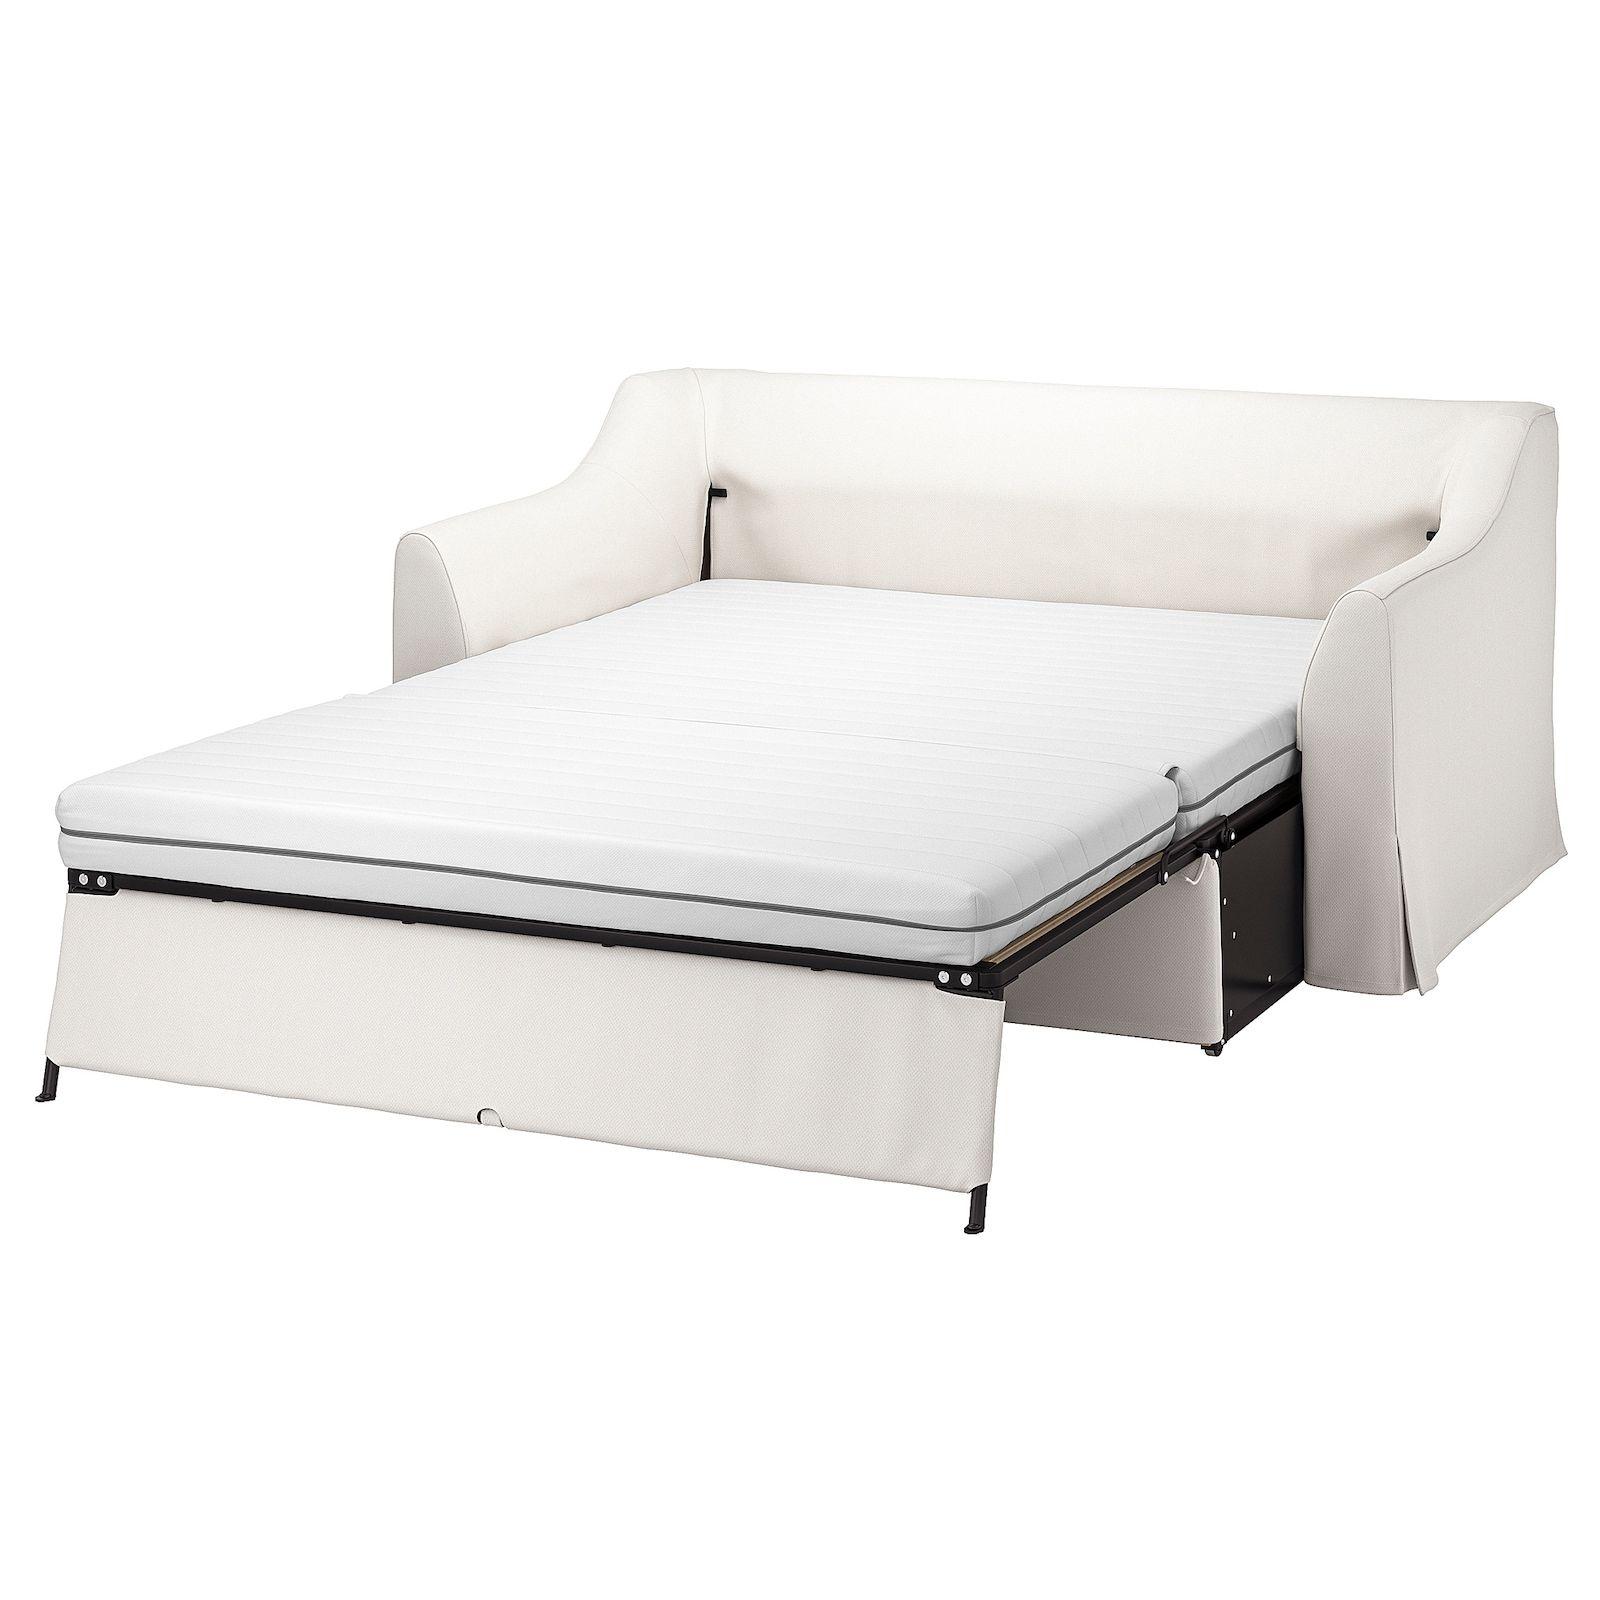 Farlov Sleeper Sofa Flodafors White Ikea In 2020 Ikea Sofa Bed Mattress Sofa Foam Sofa